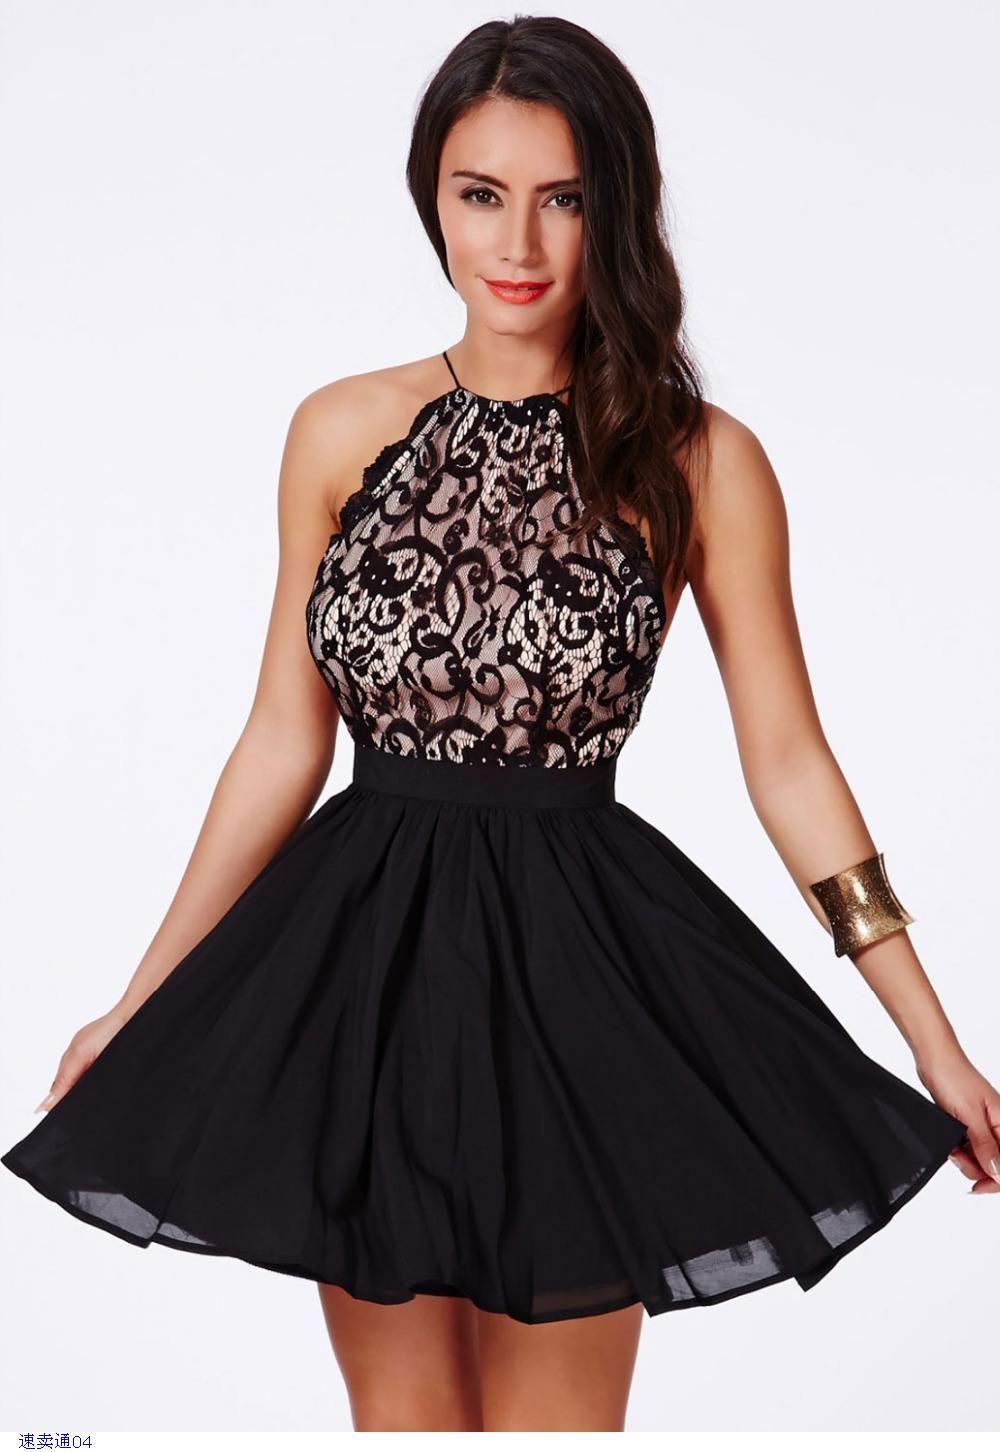 17  images about Formal Dress on Pinterest  Black prom dresses ...